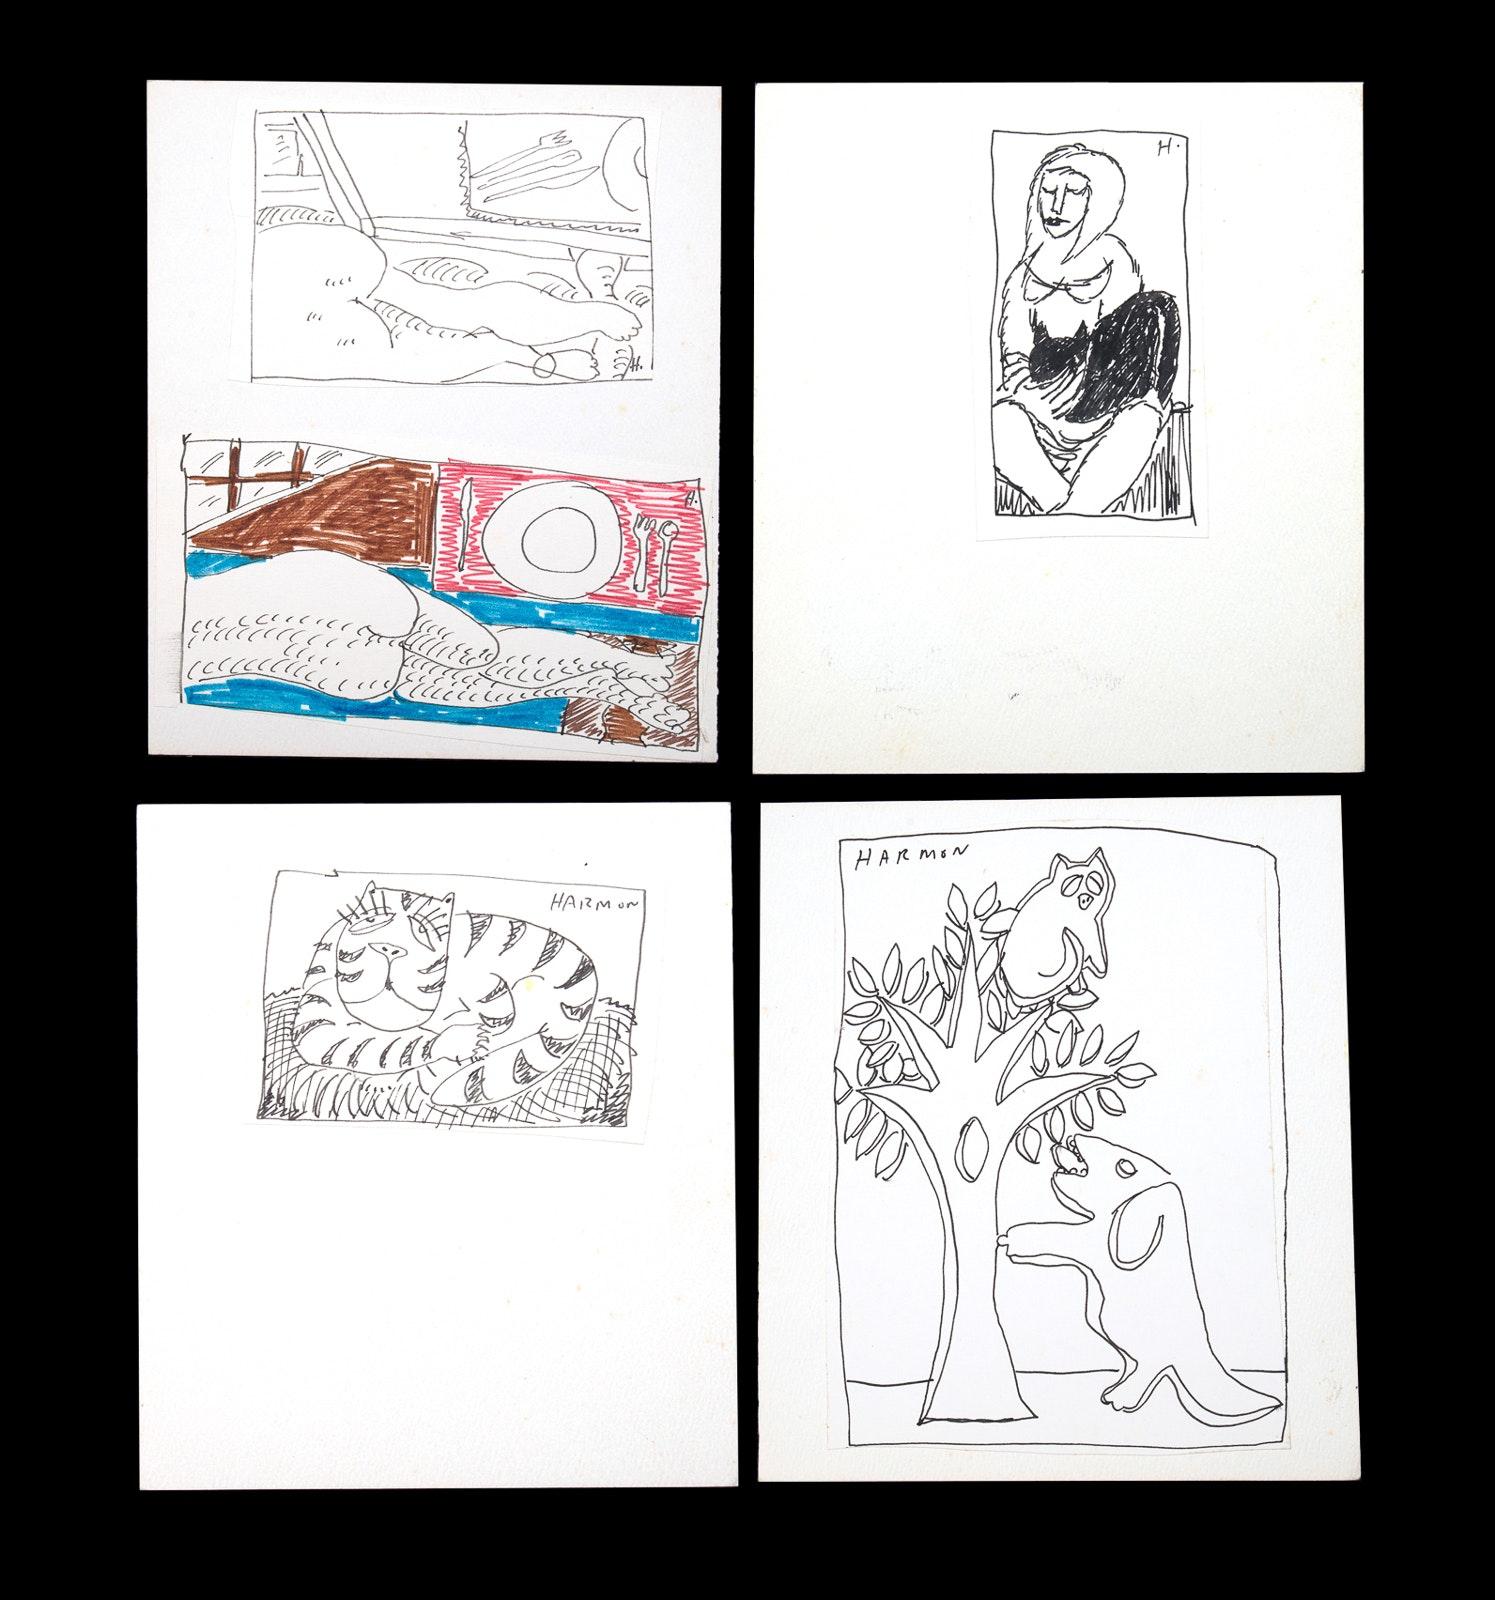 Four Paul Harmon Sketches